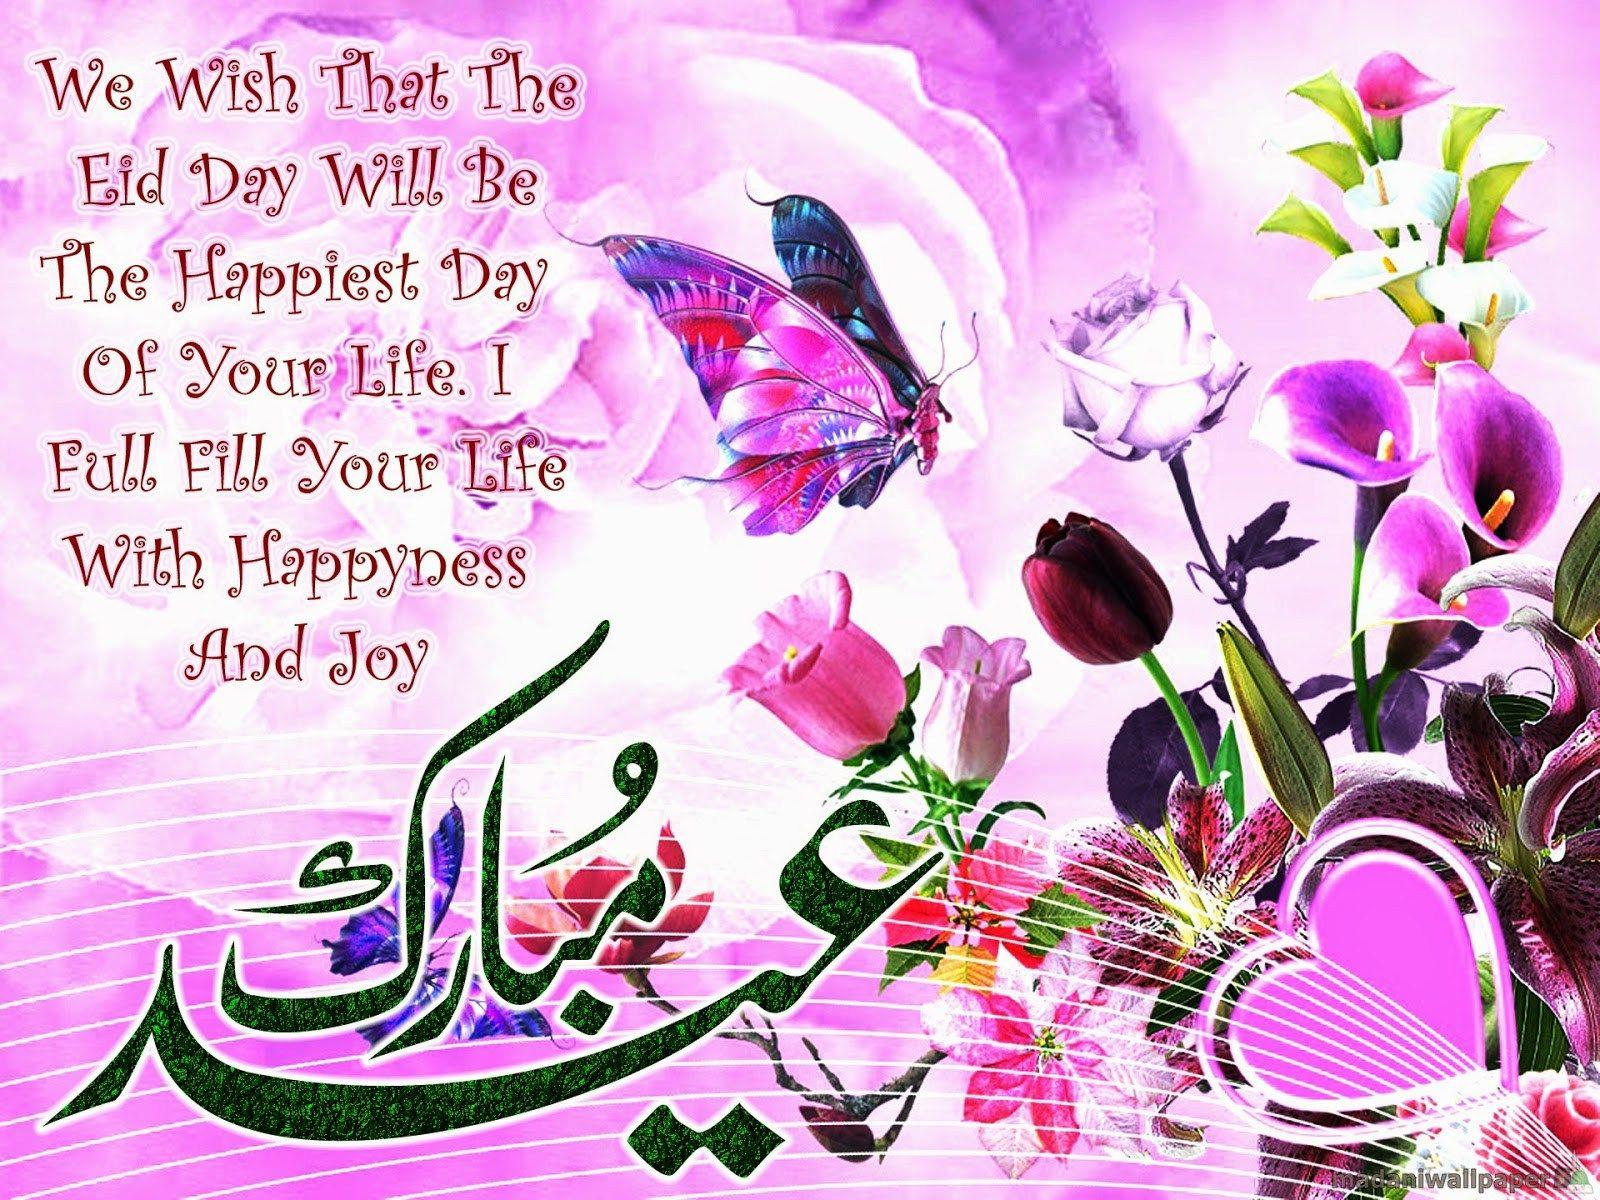 Latest eid al adha 2016 sms wishes greetings messages 7 latest eid al adha 2016 sms wishes greetings messages 7 m4hsunfo